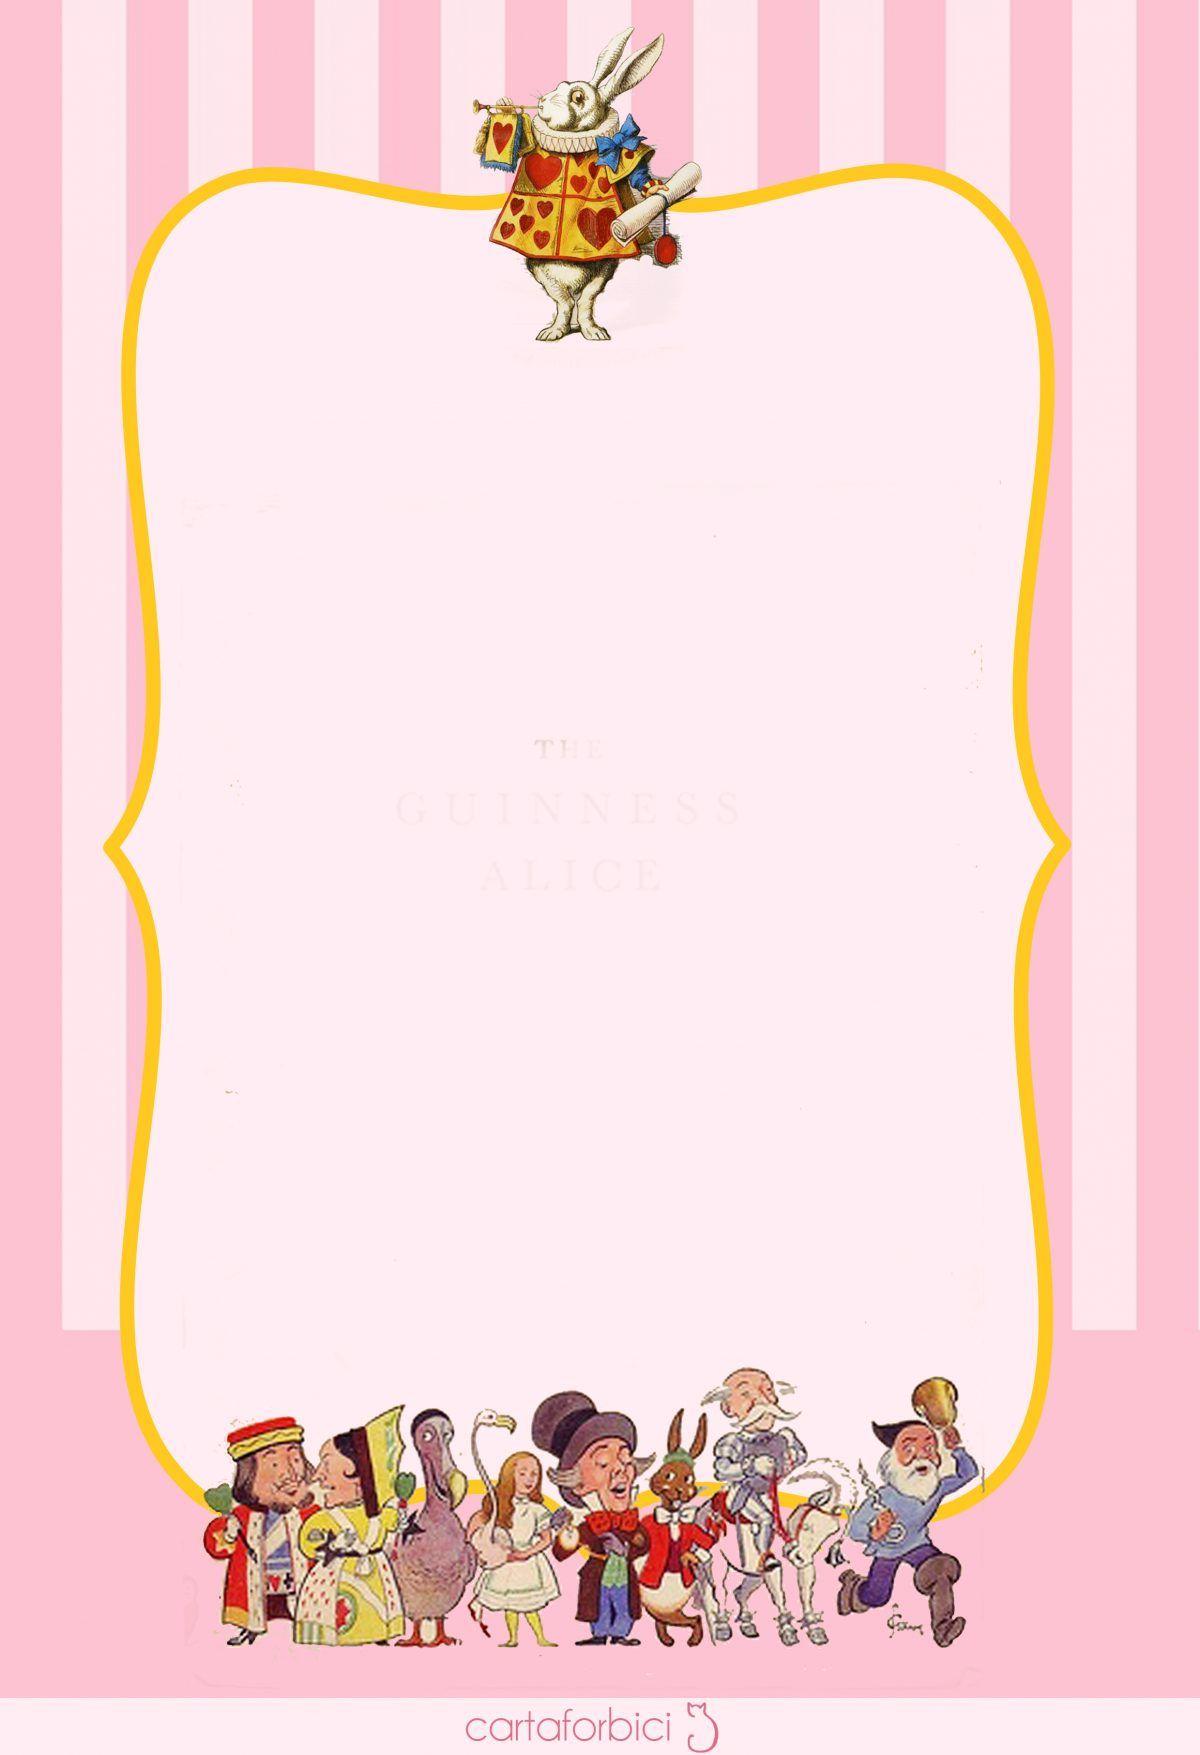 Alice In Wonderland Birthday Invitations Bagvania Free Printable Invitation Template Jpg 1200x1755